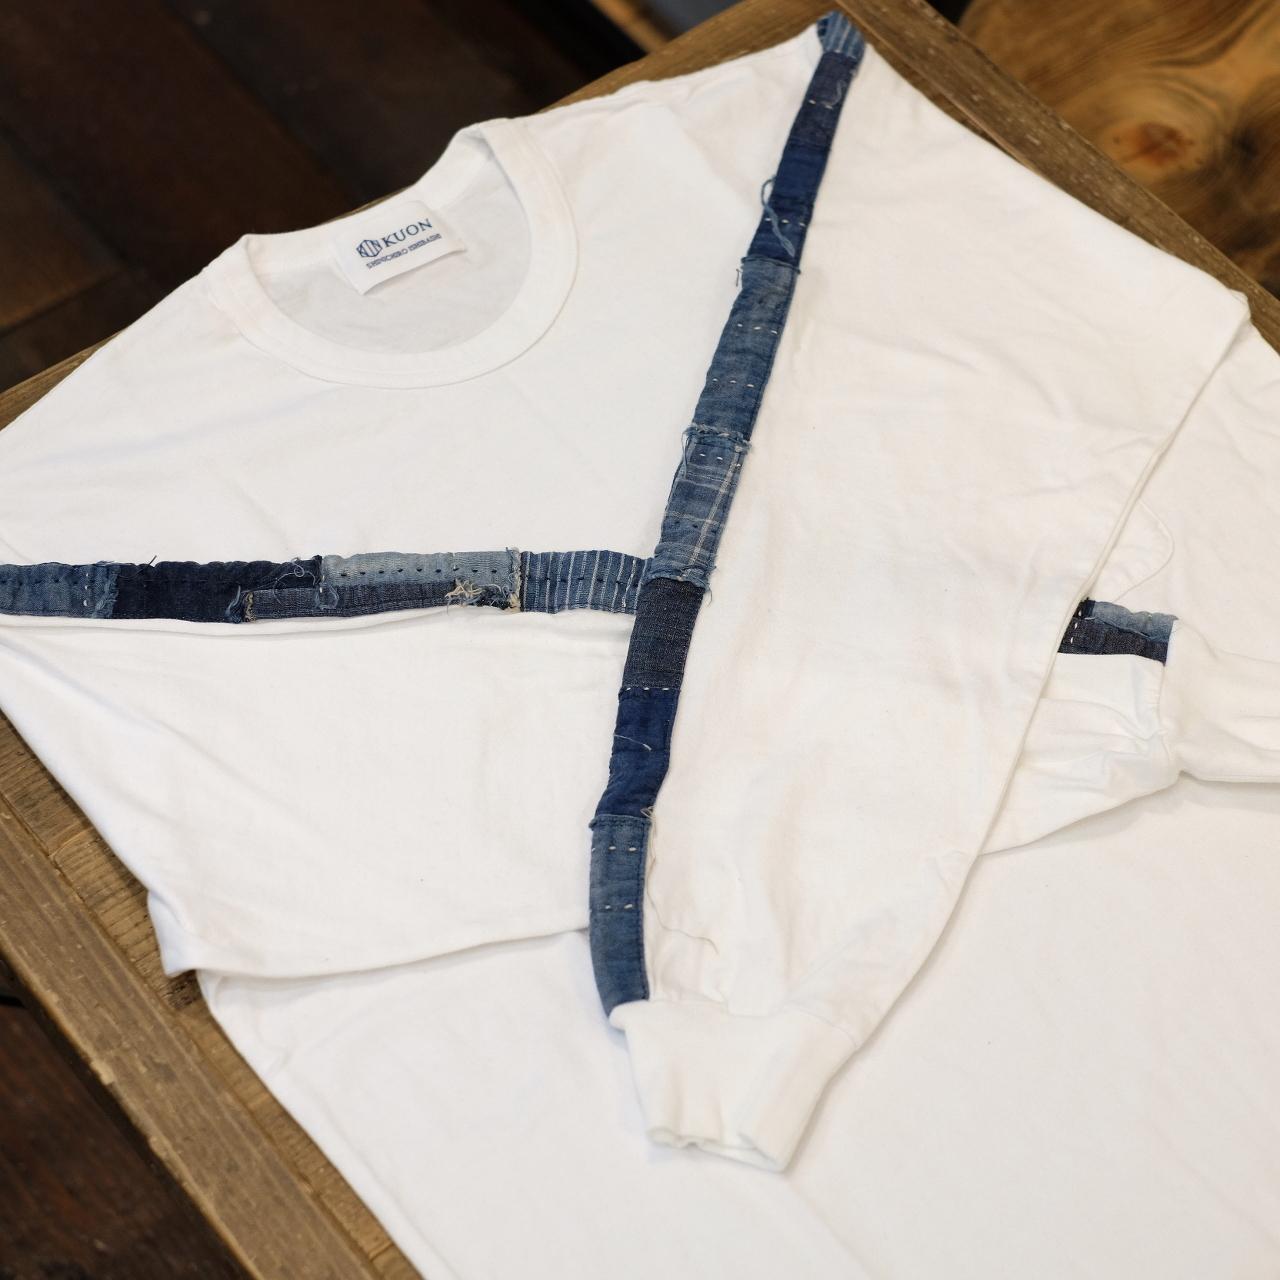 KUON(クオン) アップサイクル トリミングロングTシャツ ホワイト×ネイビー